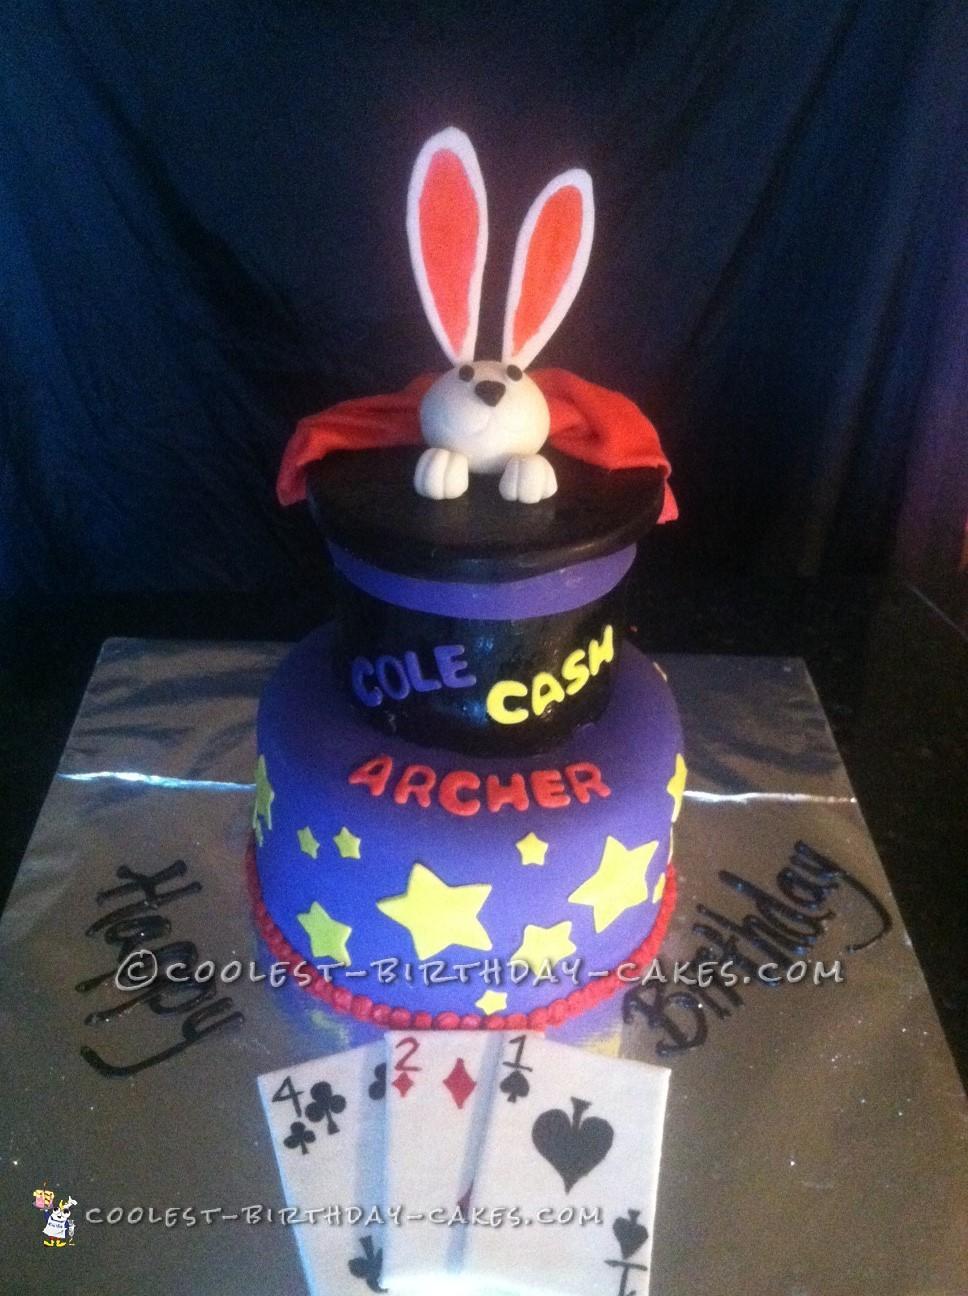 Abracadabra! Cool Magical Birthday Cake